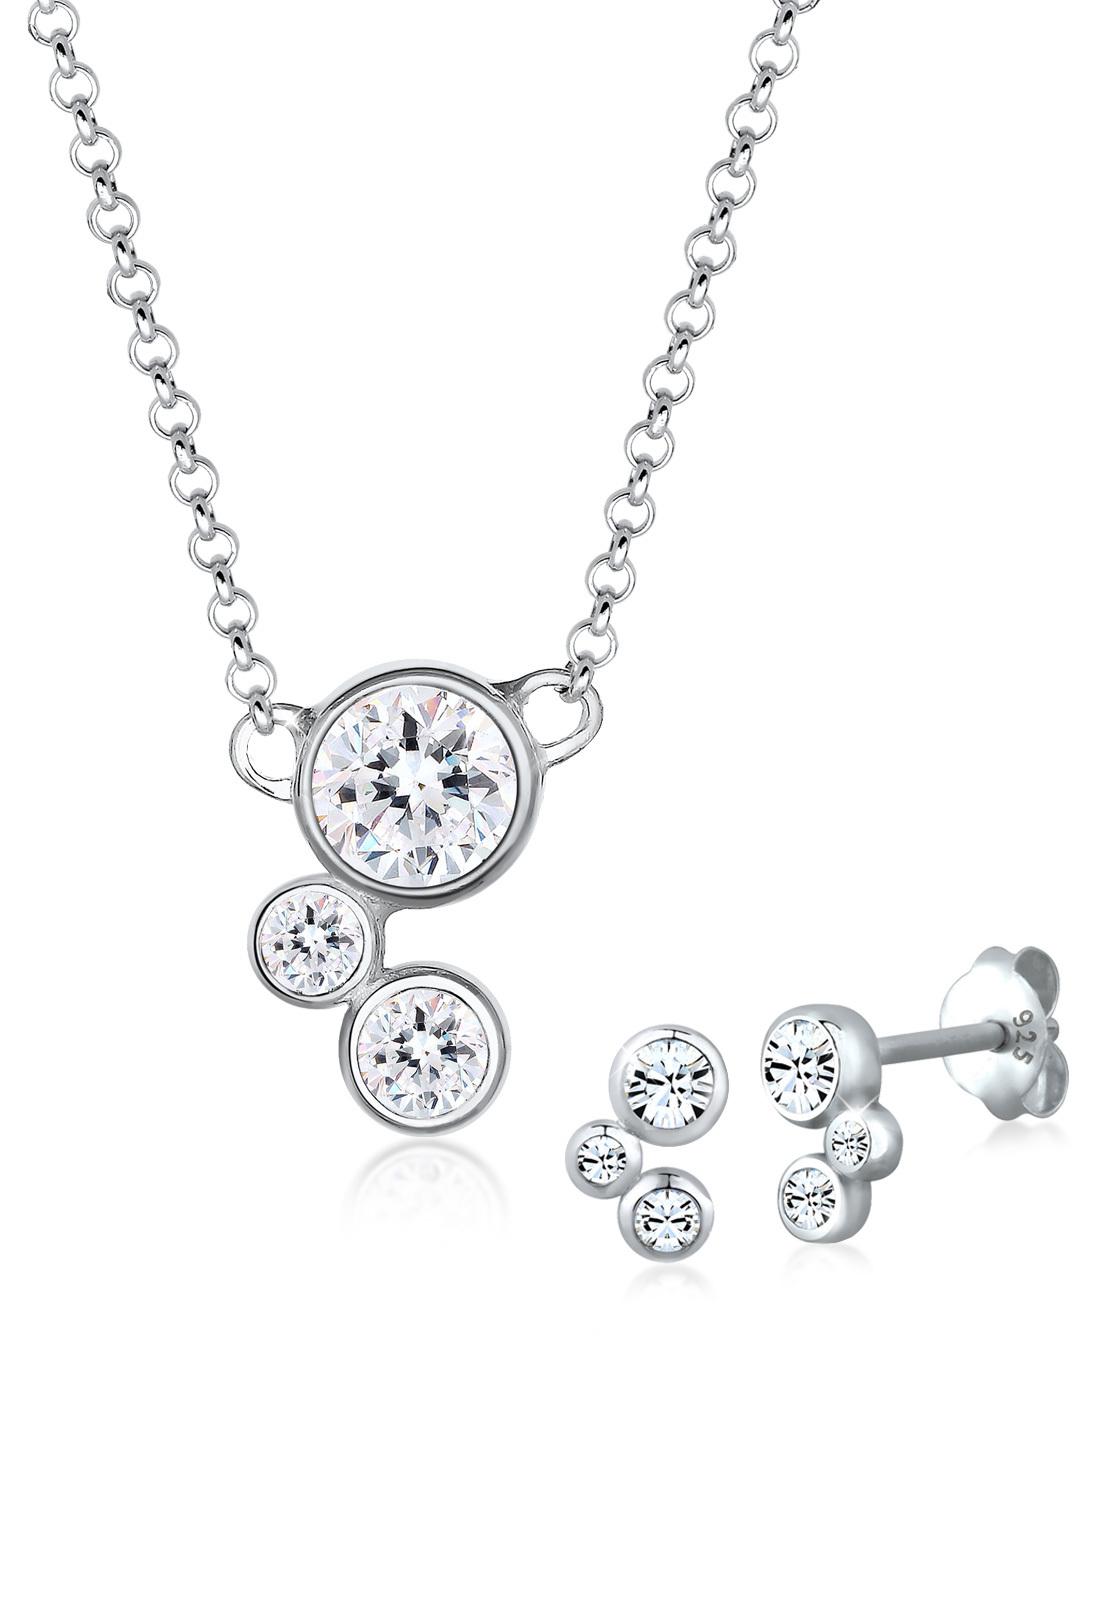 Schmuckset   Kristall ( Weiß )   925er Sterling Silber